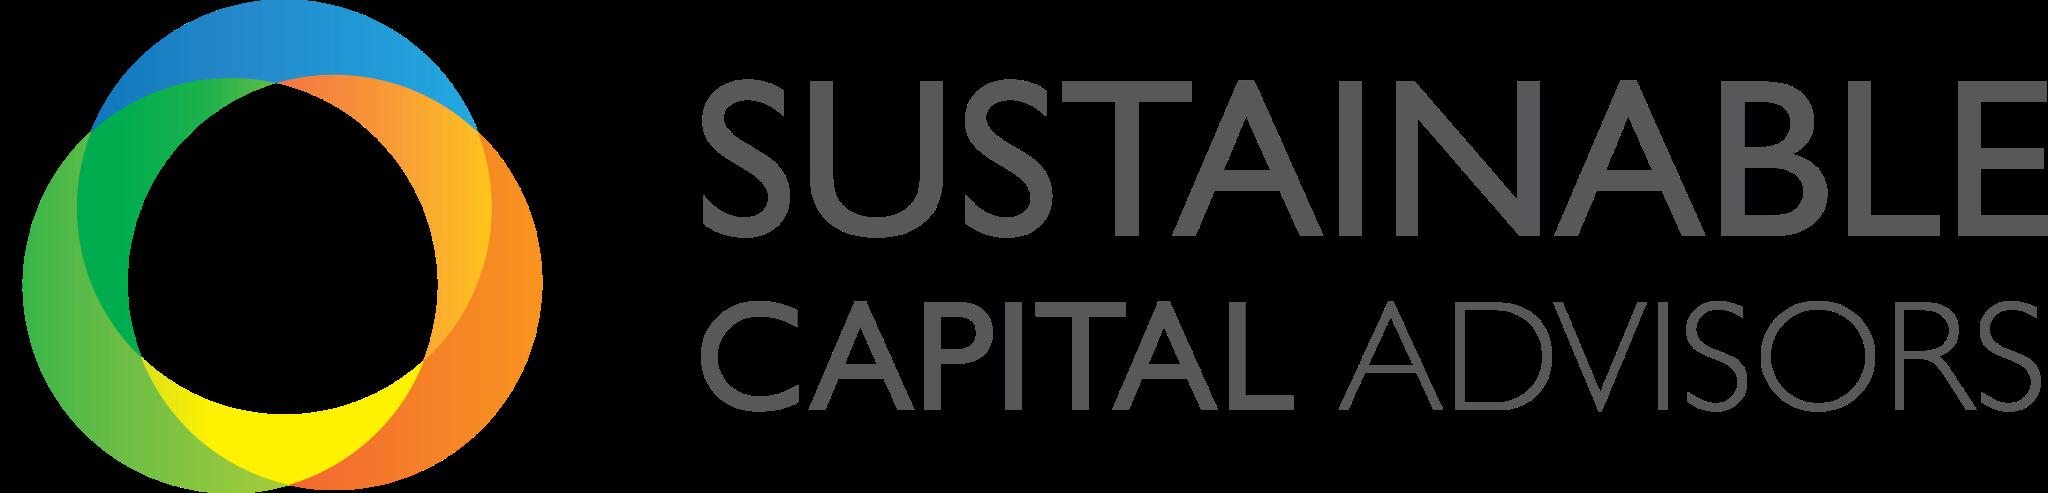 Sustainable Capital Advisors